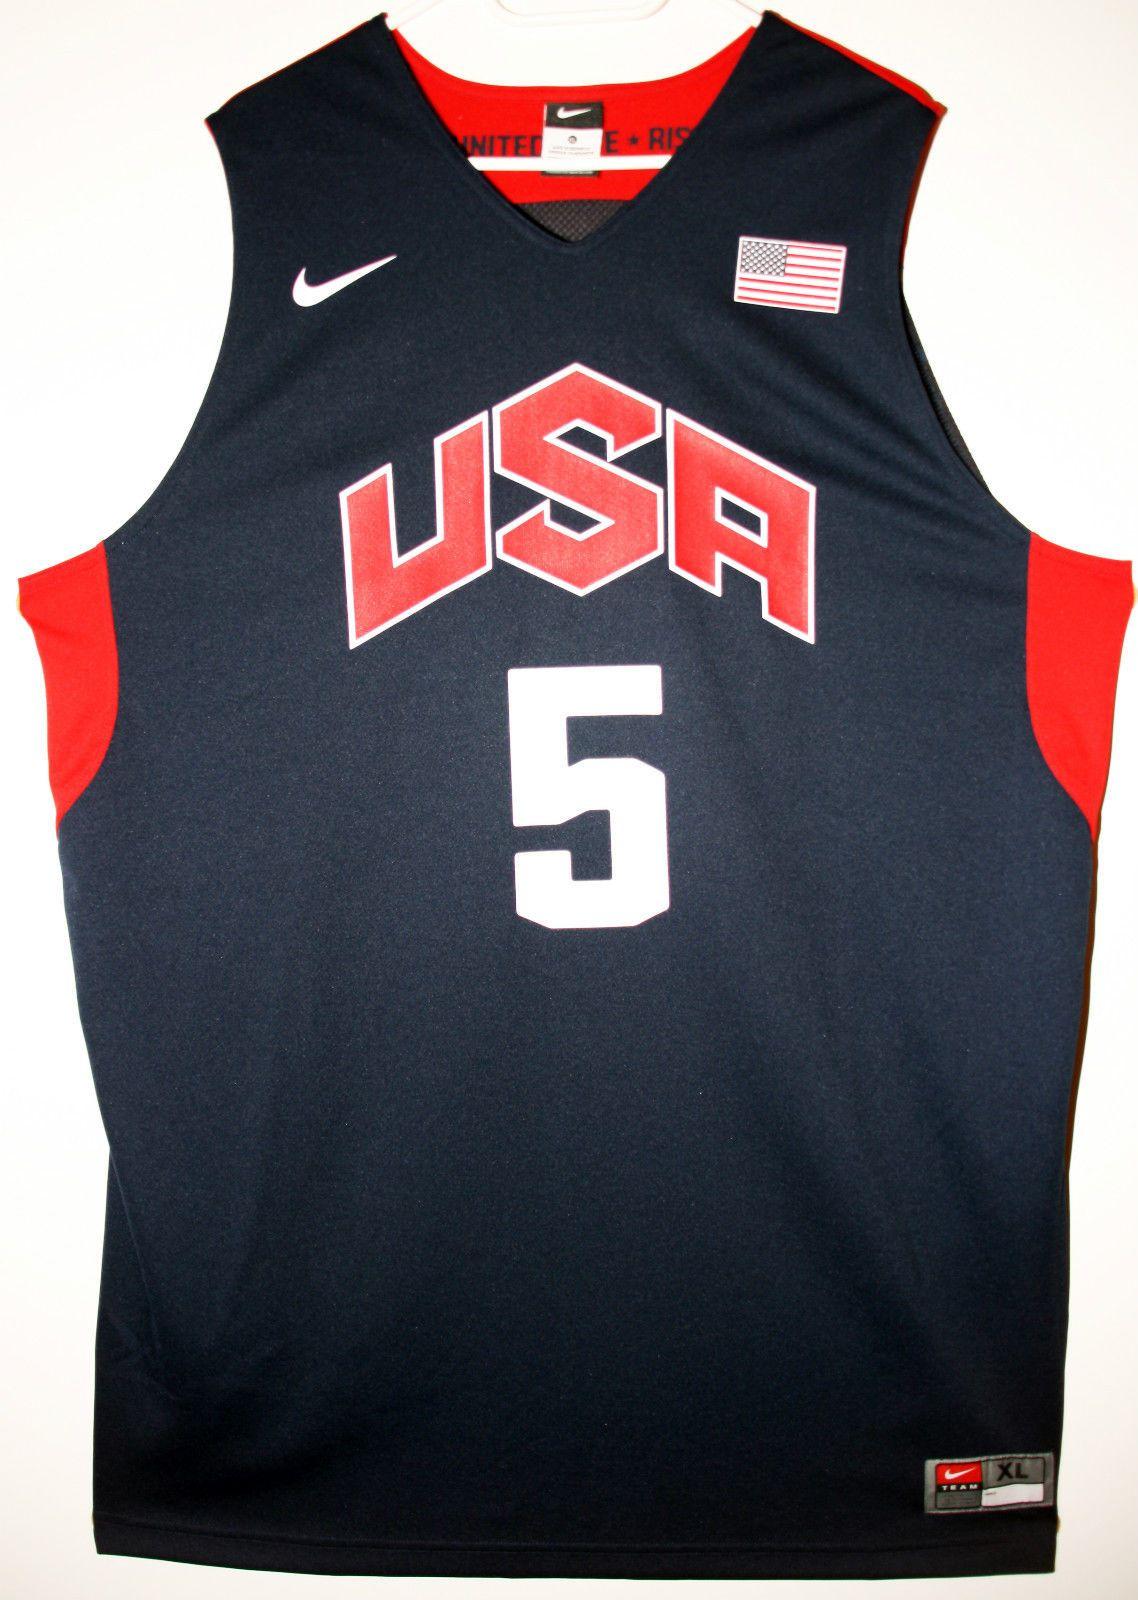 3a6a10af9 Nike NBA Basketball USA Basketball Team  5 Kevin Durant Trikot Jersey Size  48 -